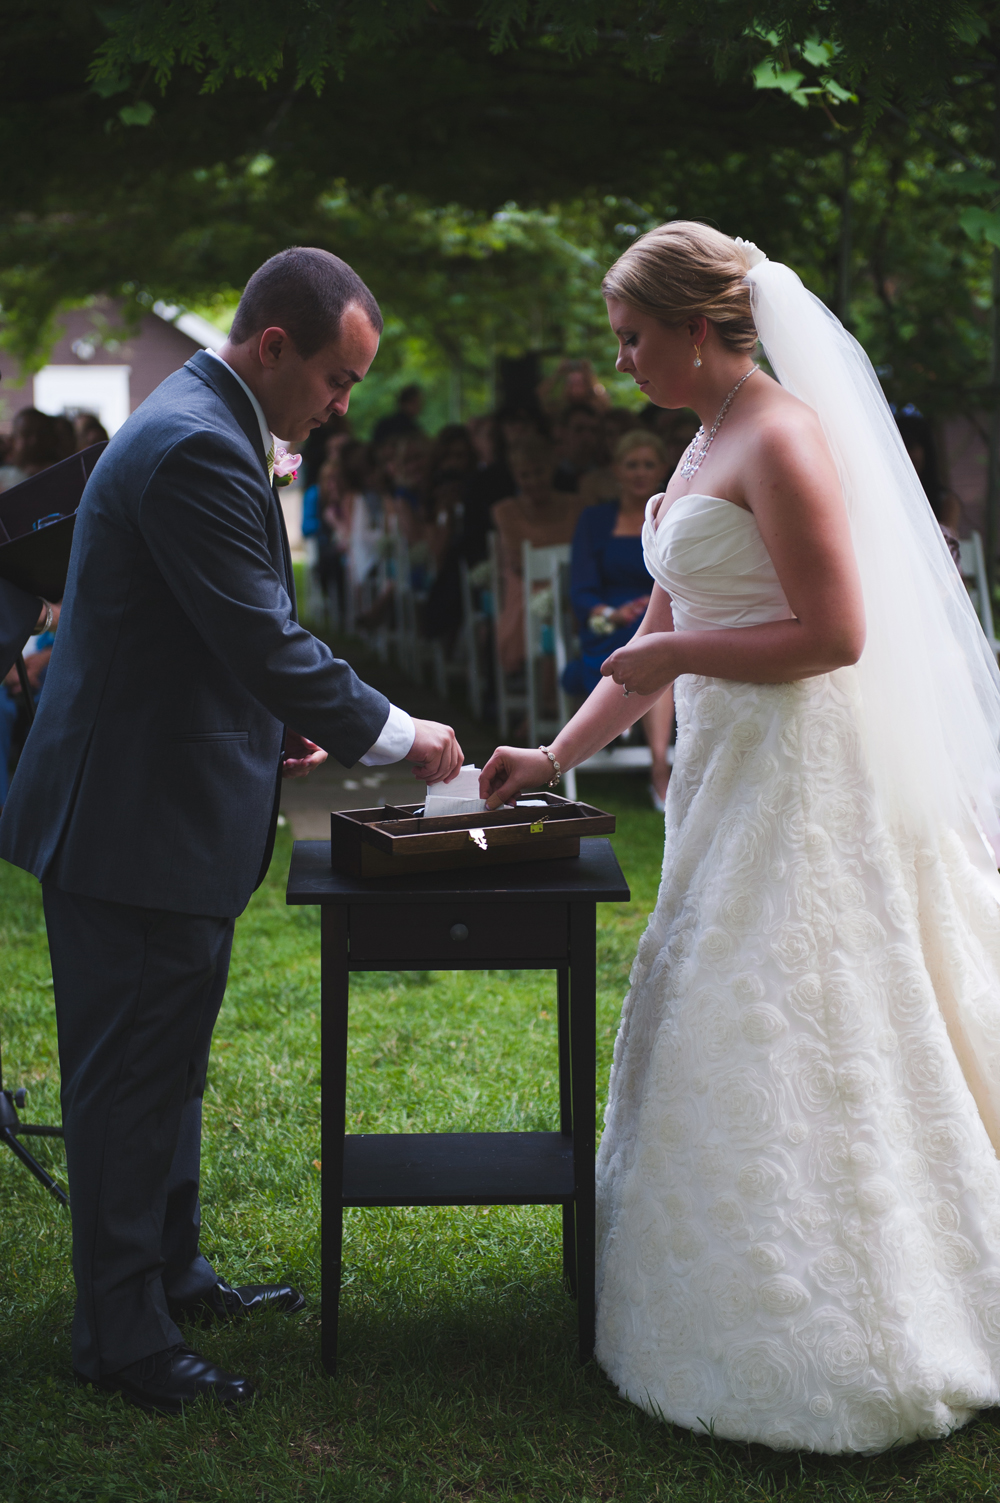 Tarrywile-Mansion-Wedding-Greg-Lewis-Photo-49